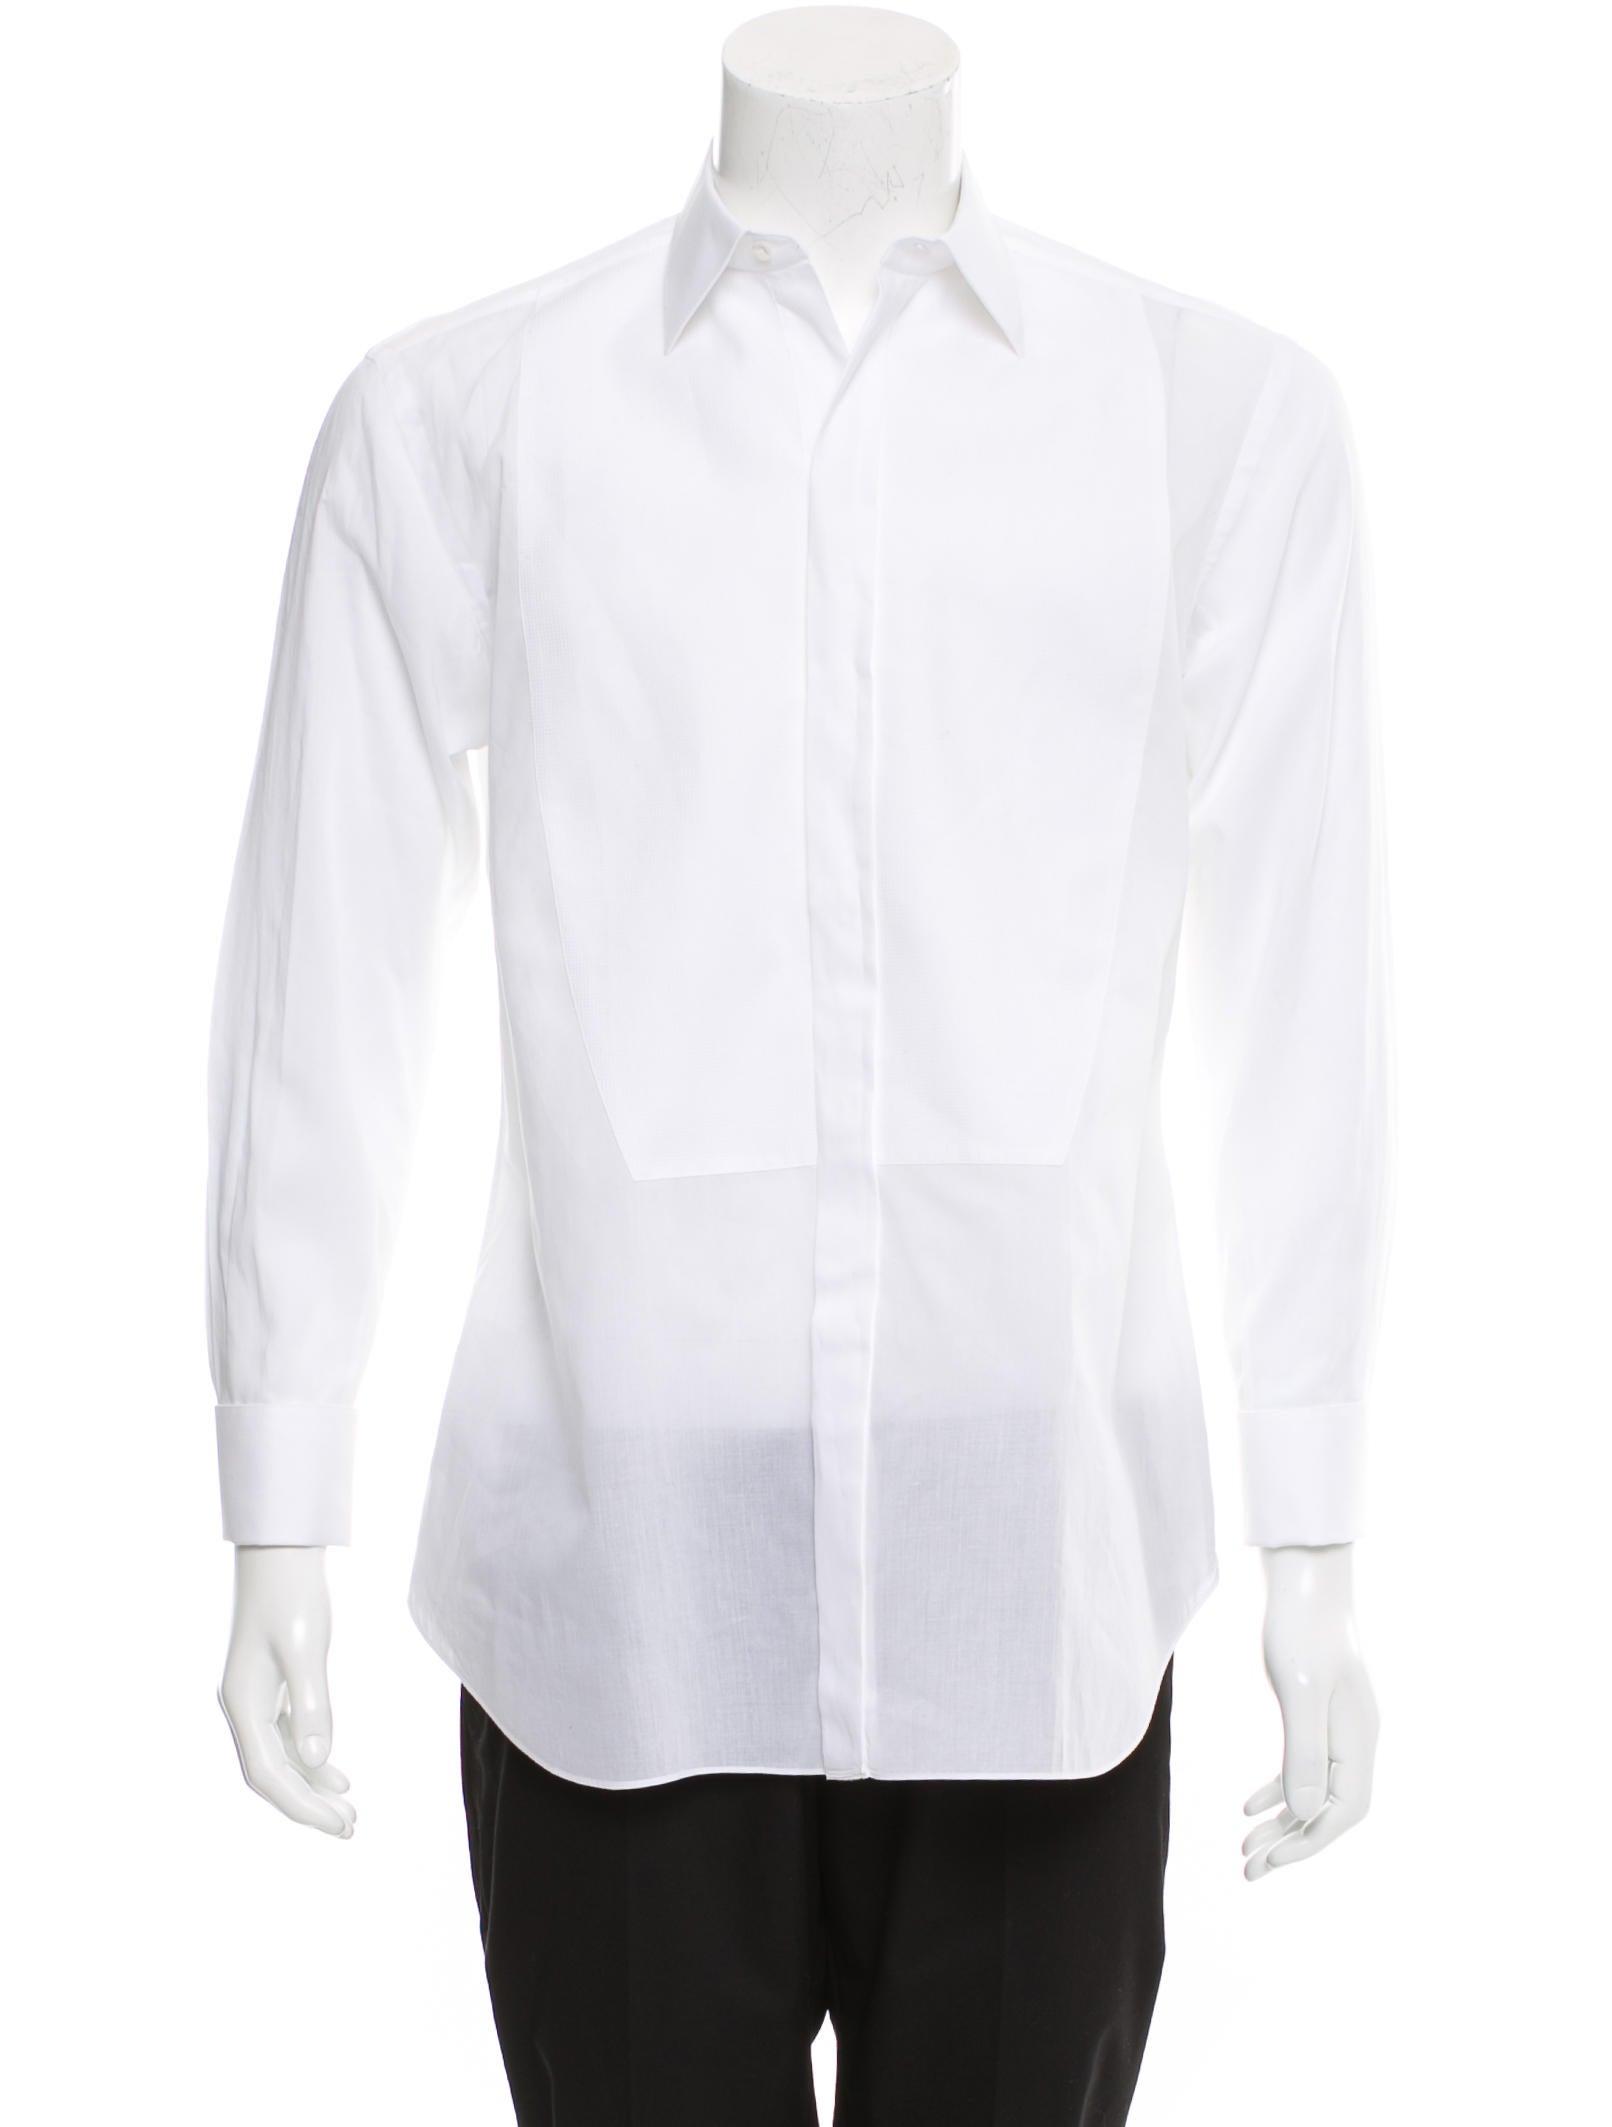 Brioni french cuff tuxedo shirt clothing bro22411 for Tuxedo shirt french cuff